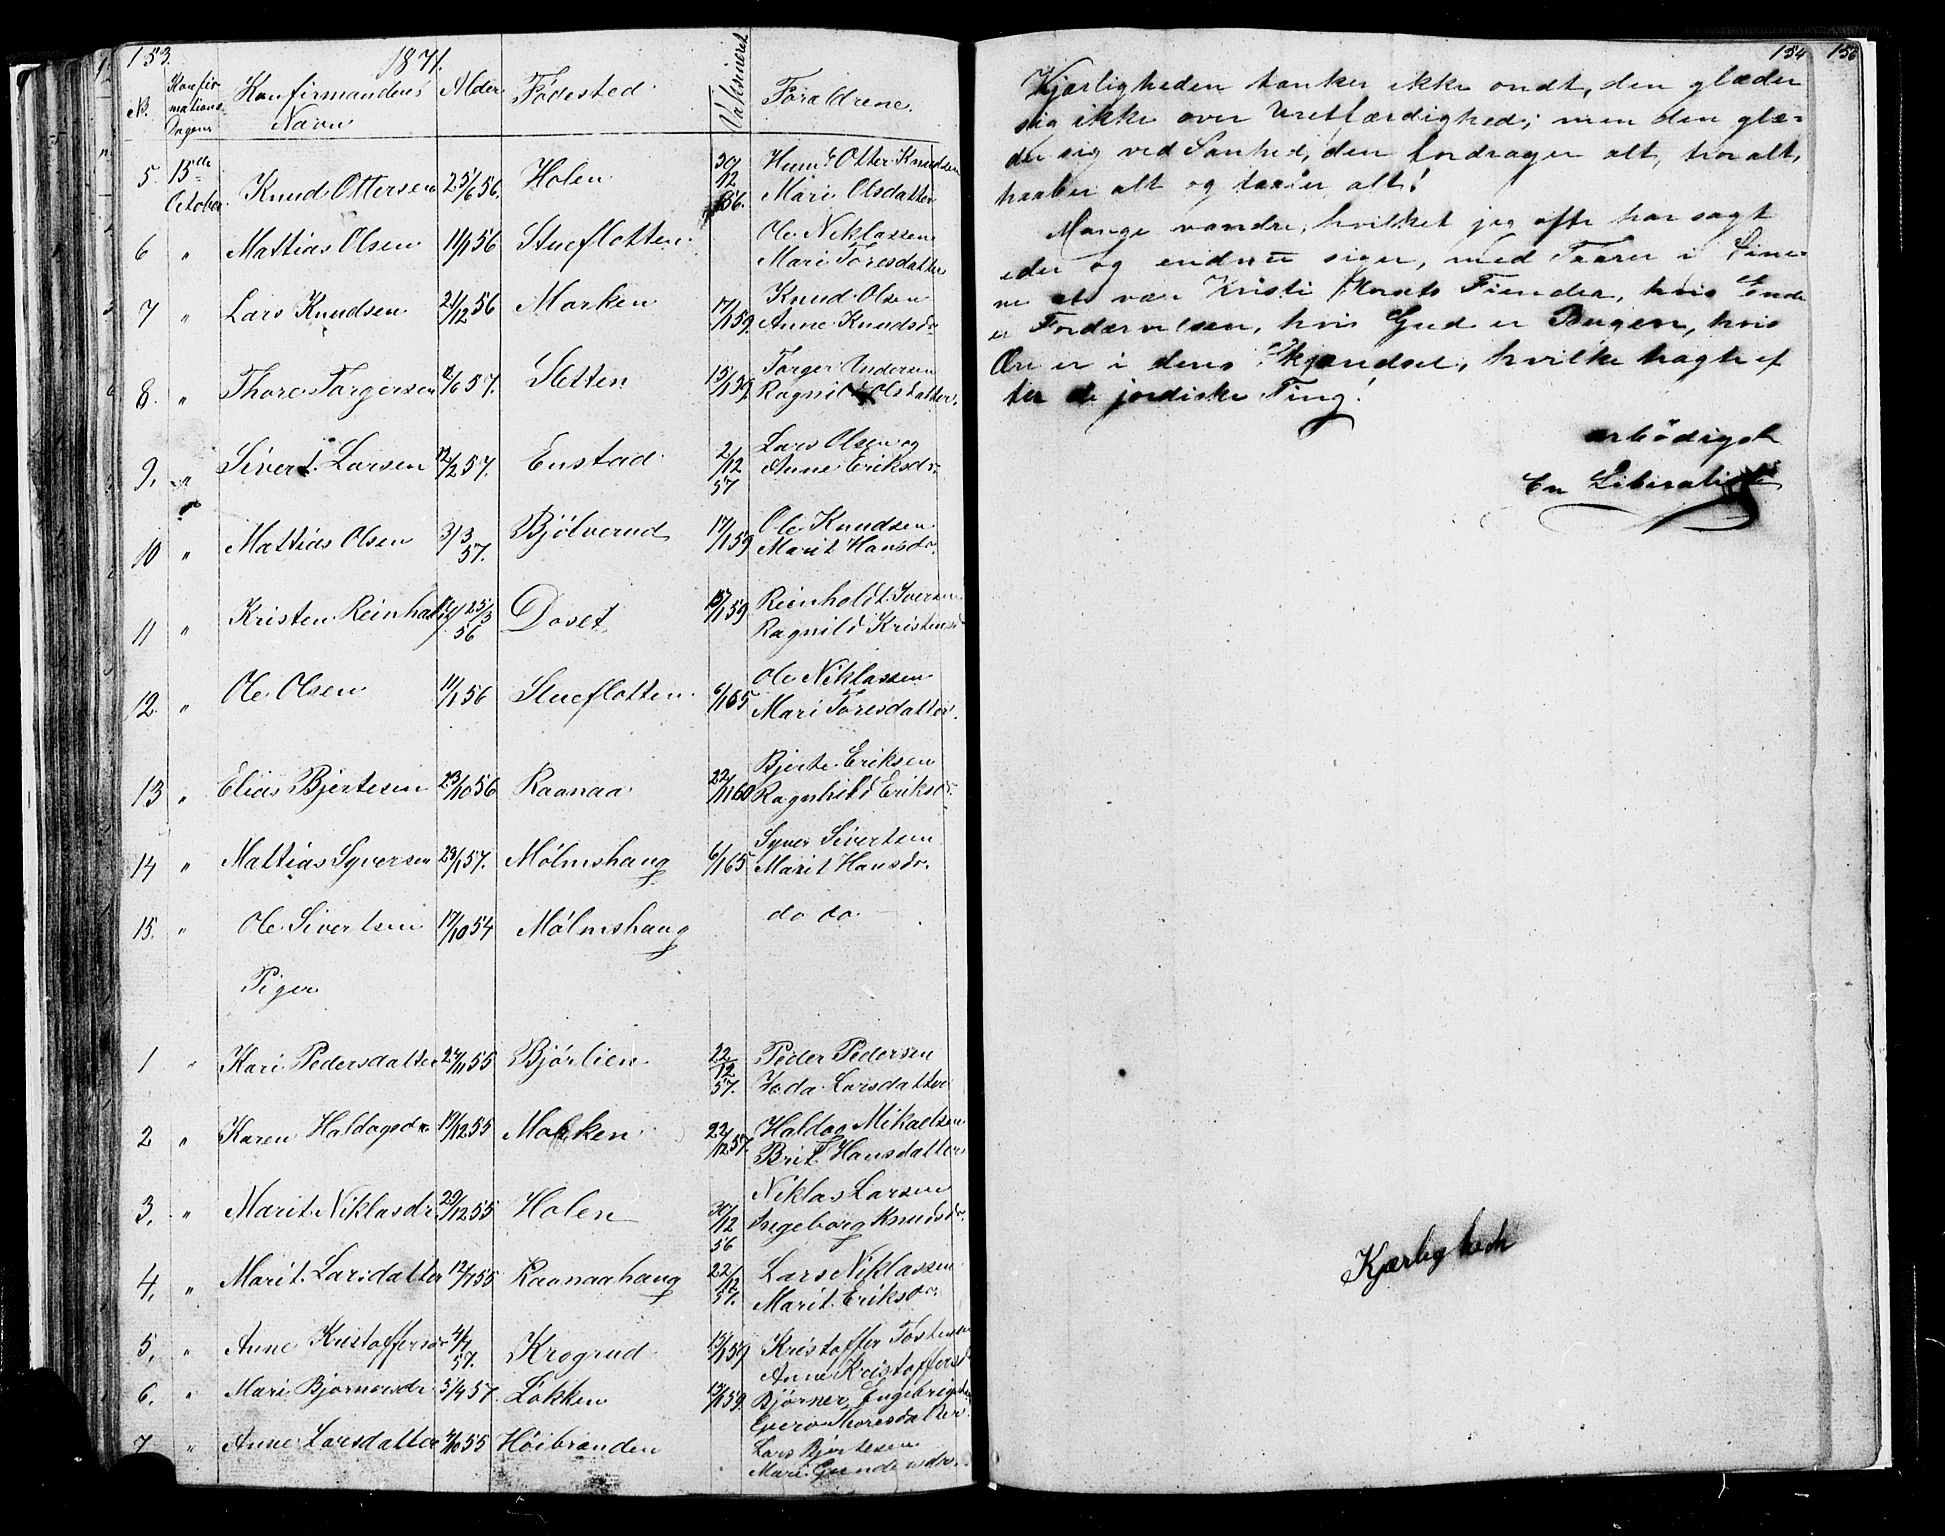 SAH, Lesja prestekontor, Klokkerbok nr. 4, 1842-1871, s. 153-154